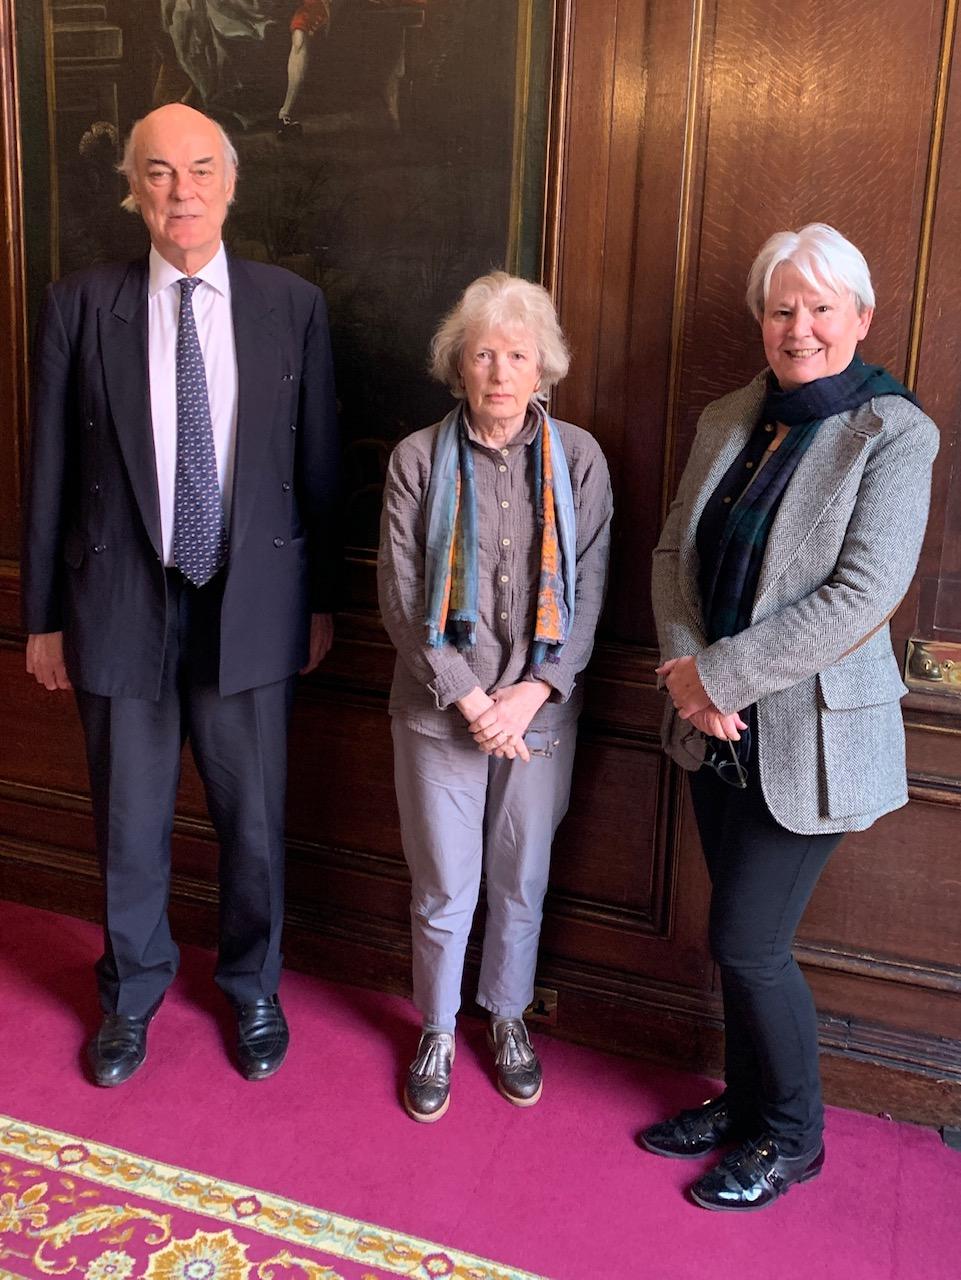 (L-R) Guy Heald, Jane Maxim, Elizabeth Stanton